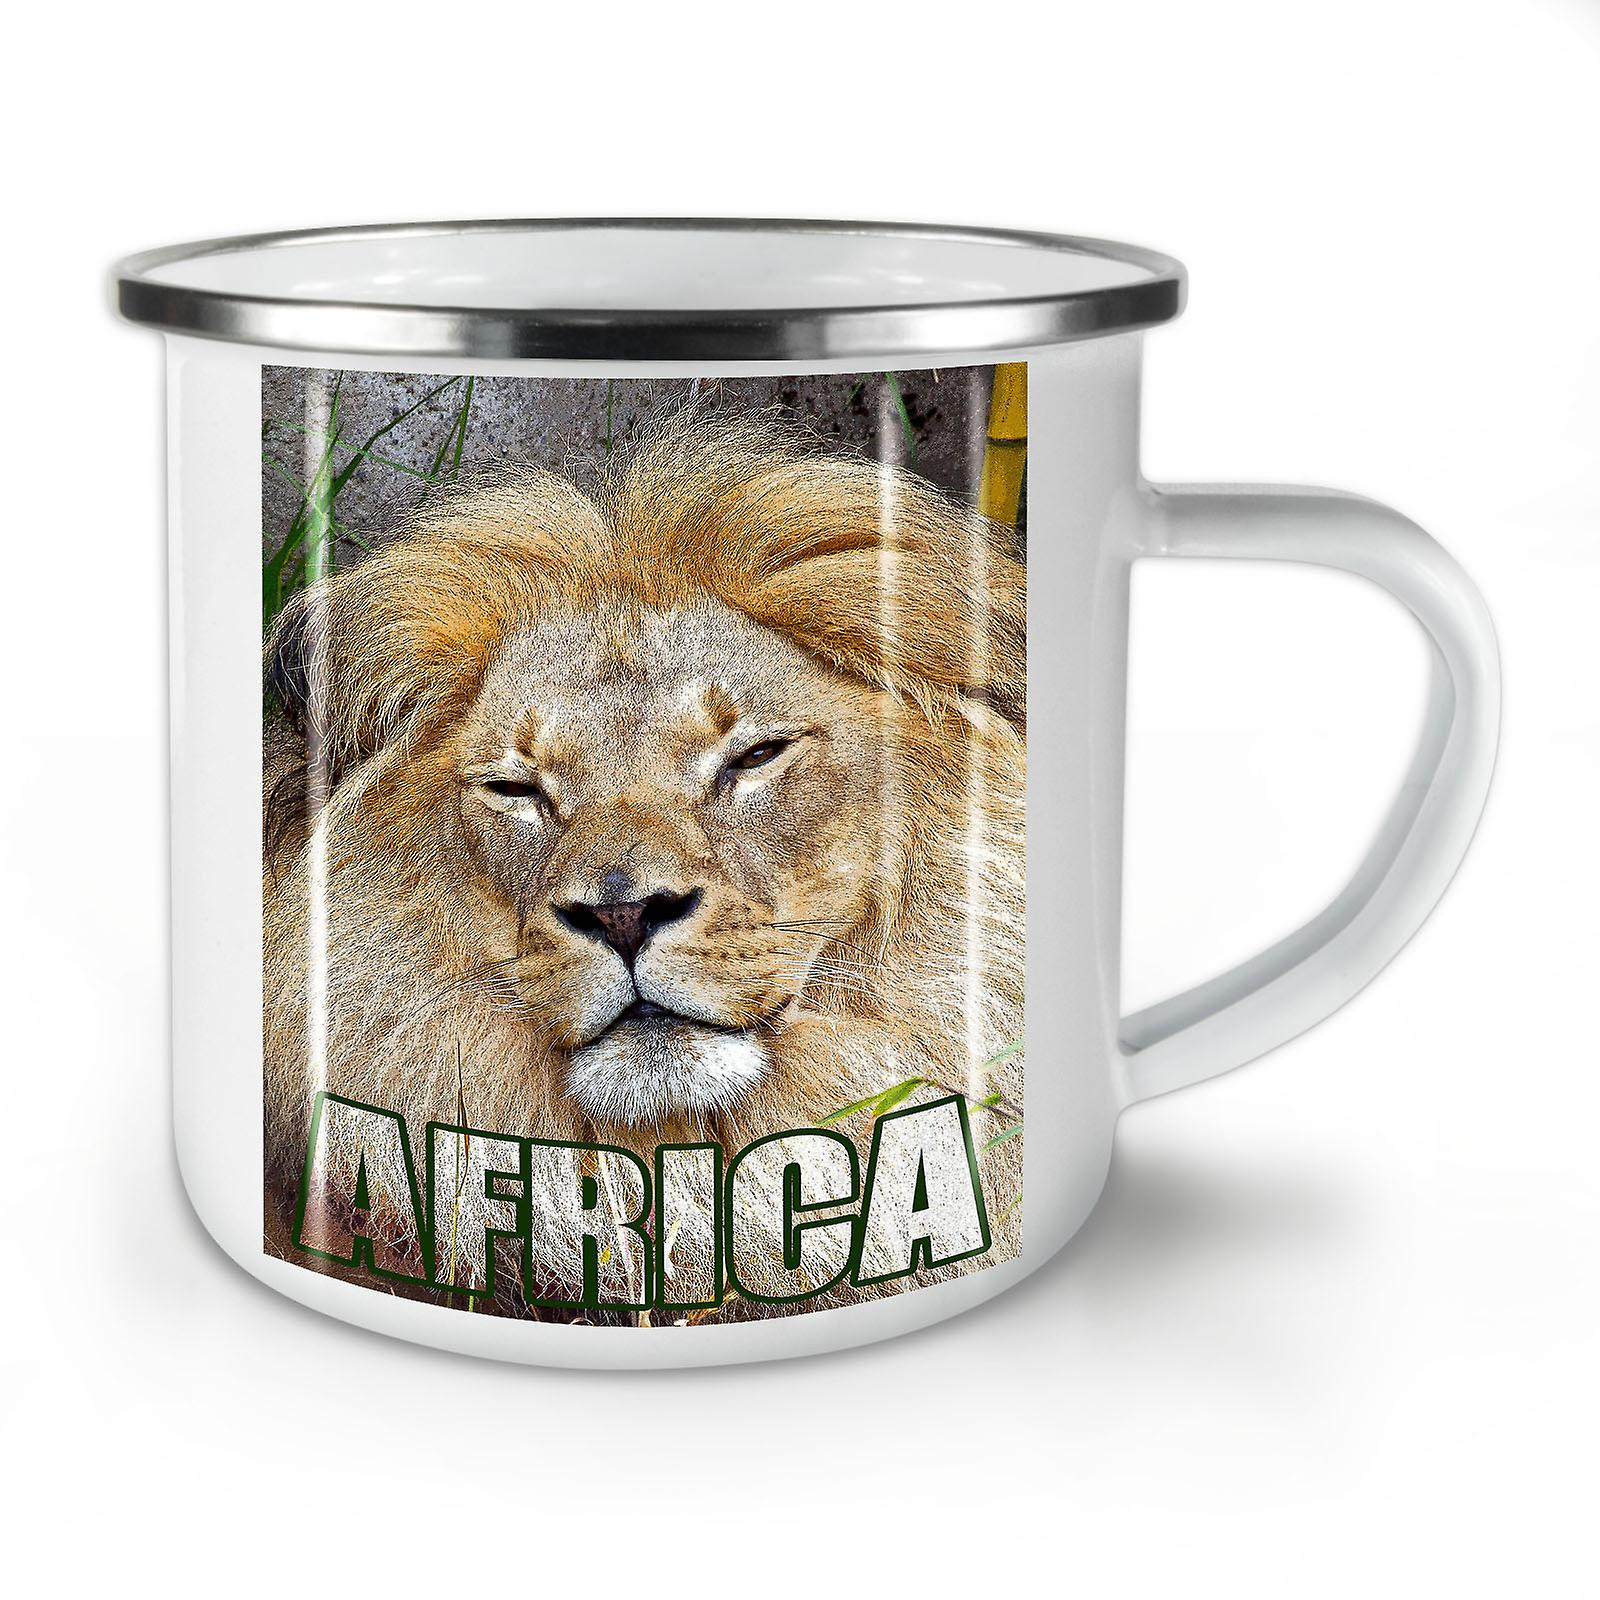 Nouvelle Afrique Whitetea Mug10 OzWellcoda Émail Sauvage Lion L'animal Café XnkwO80P